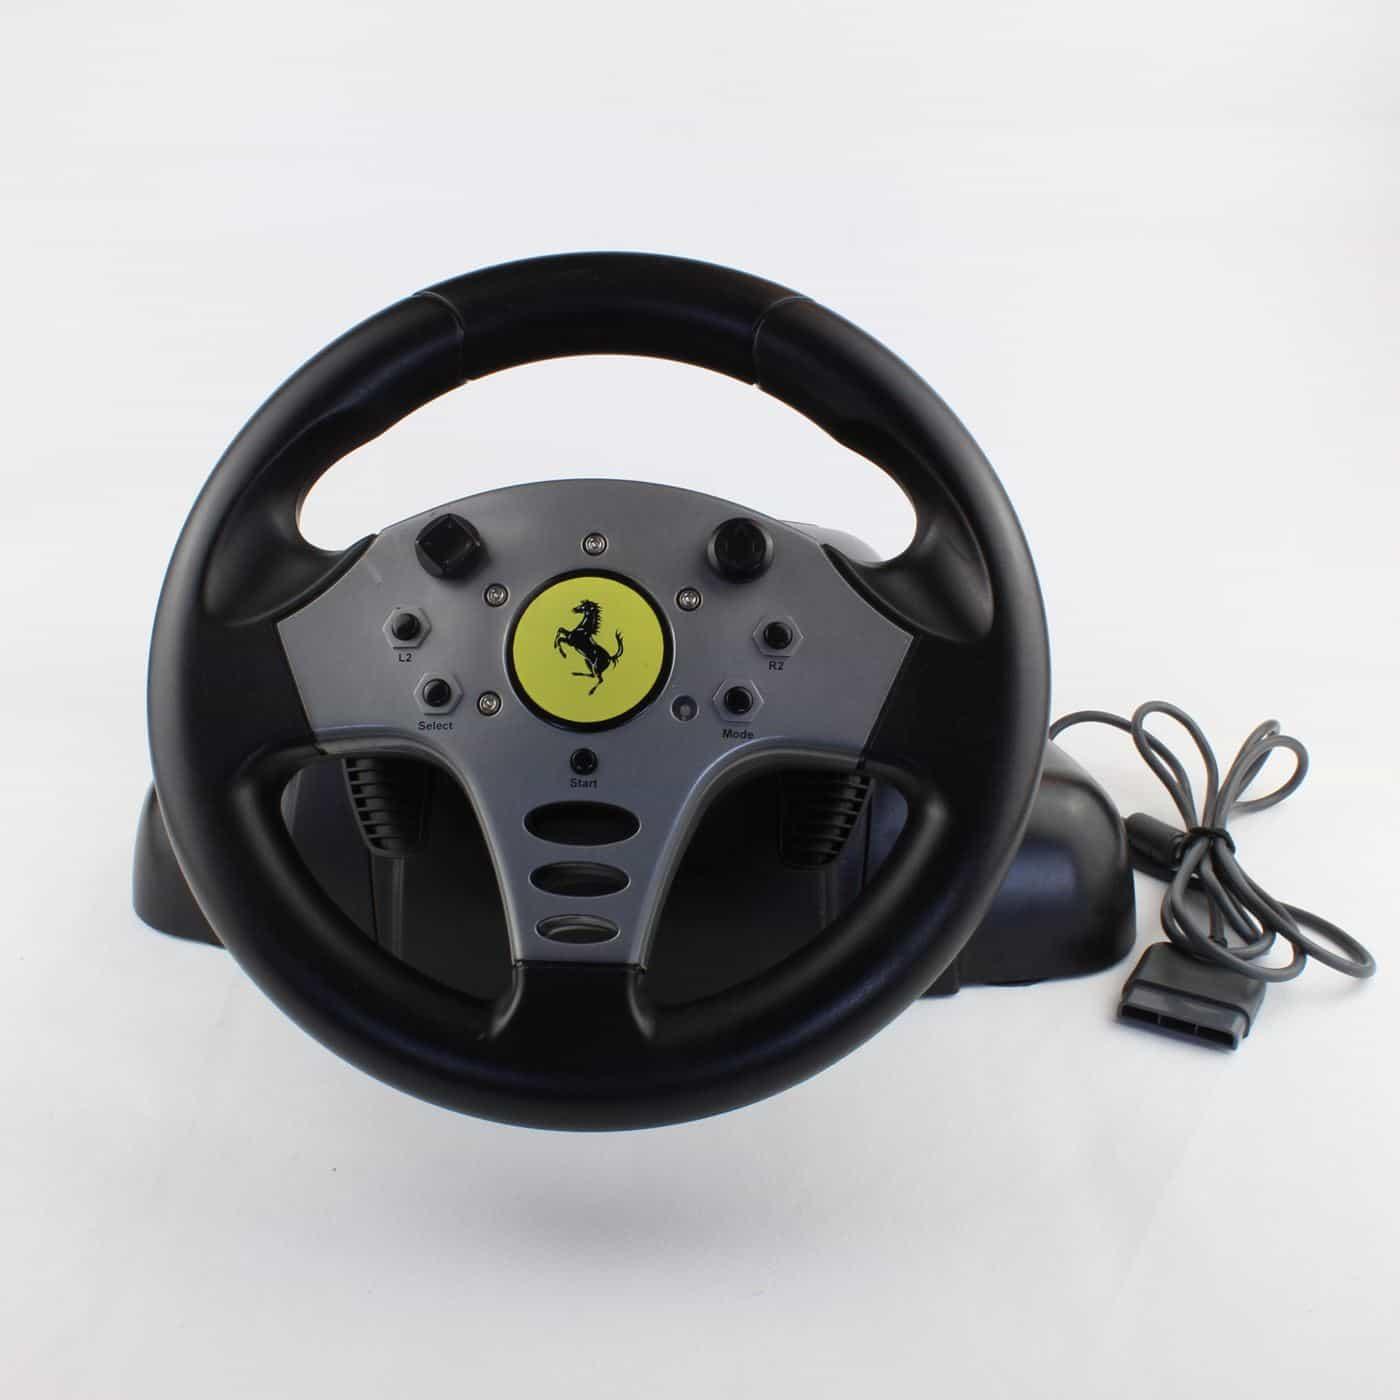 Guillemot Ferrari Steering Wheel (PS1 / PS2)